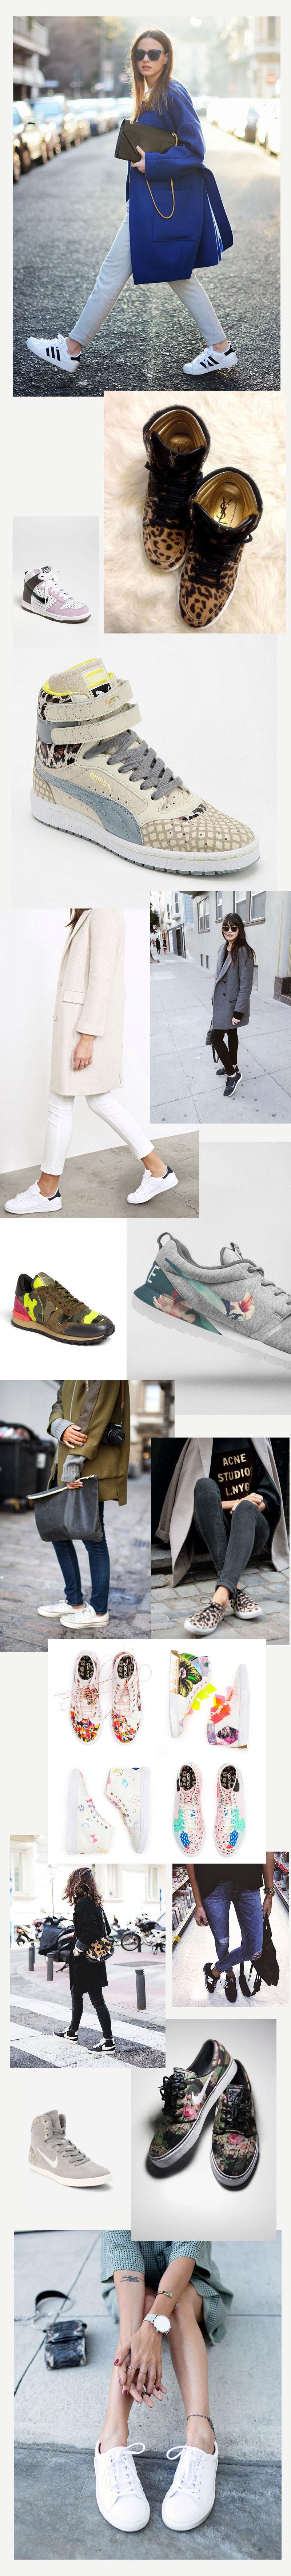 2-Style-kicks.jpg